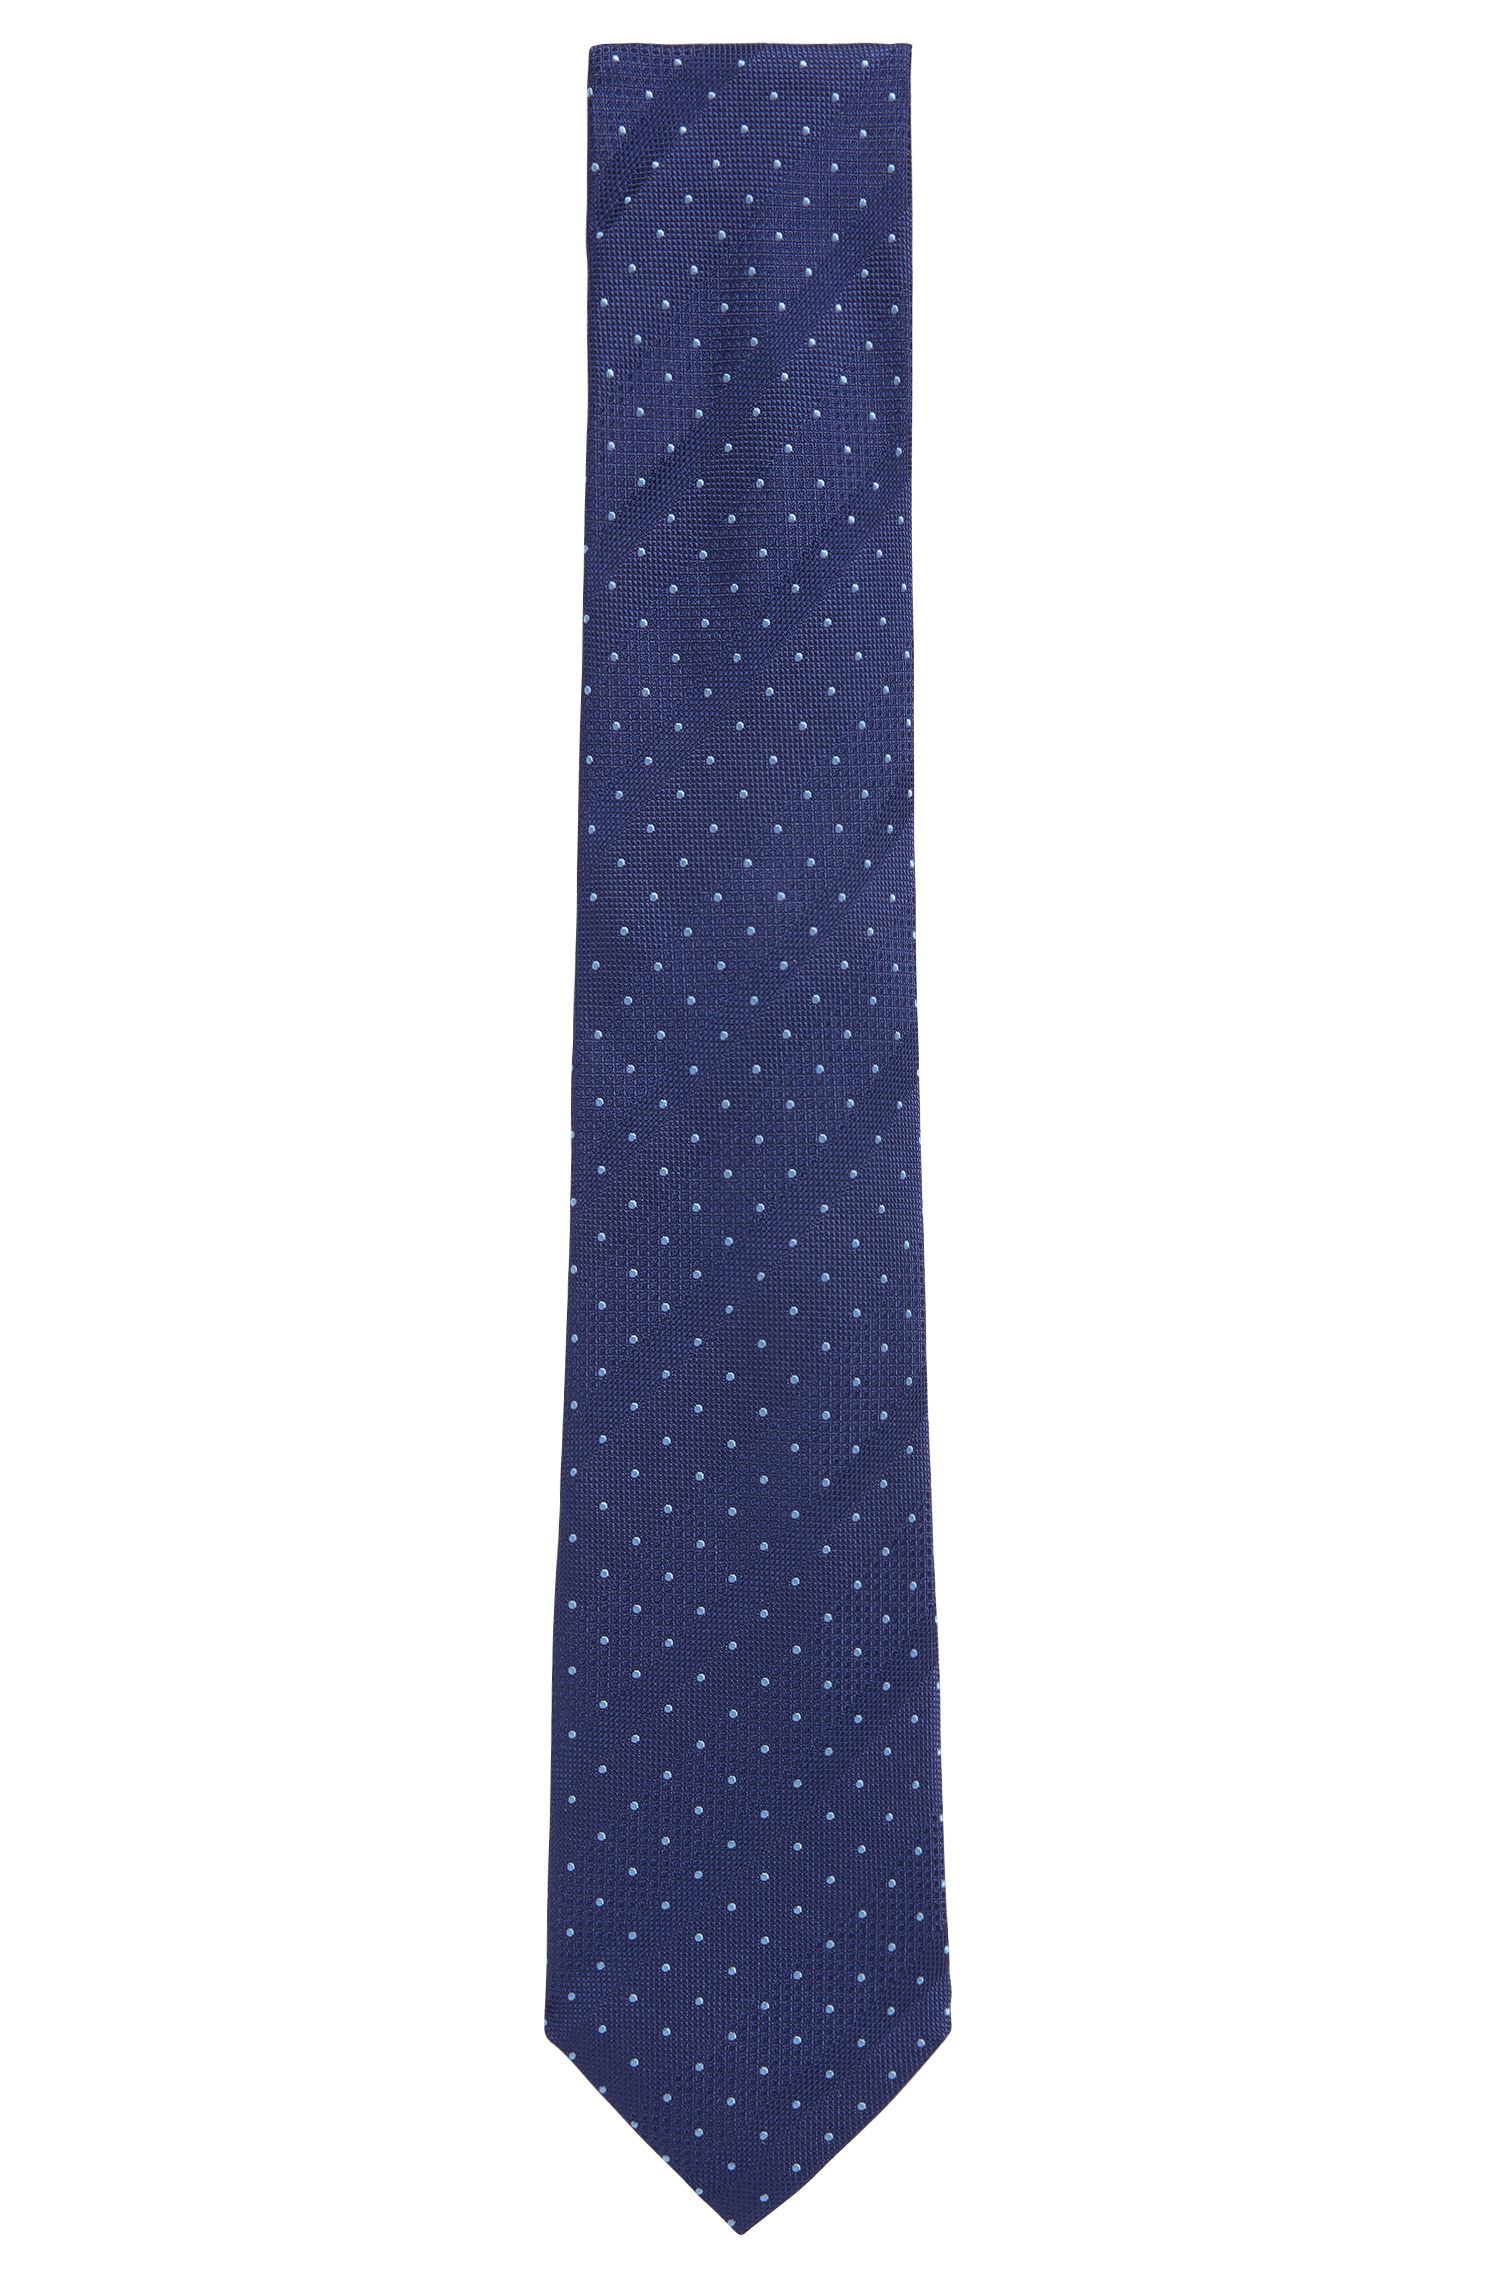 Tonal Striped & Dotted Italian Silk Tie